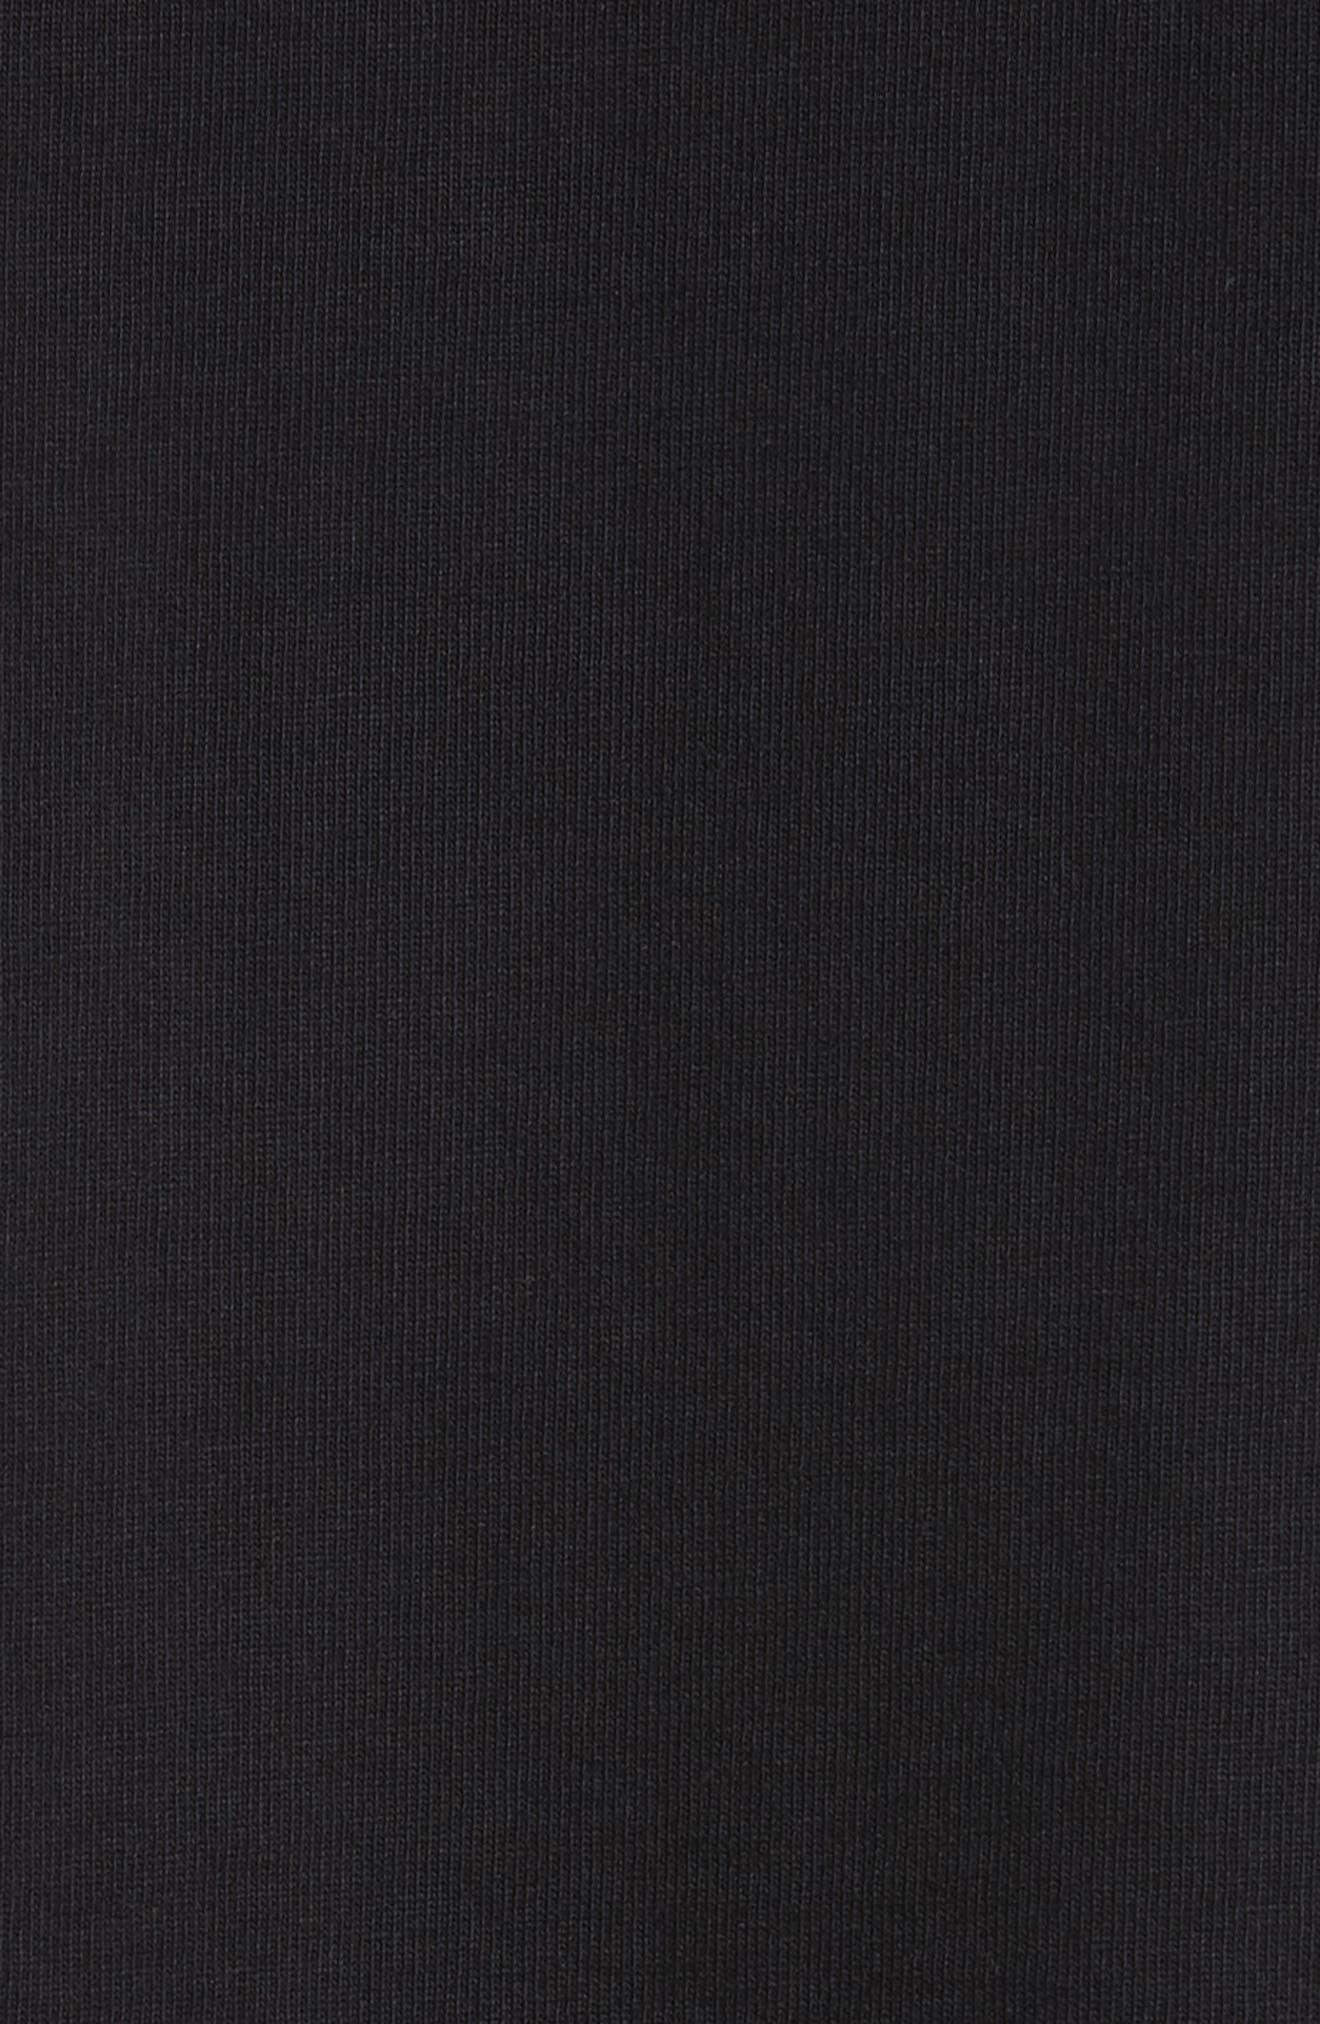 Landscape Long Sleeve T-Shirt,                             Alternate thumbnail 5, color,                             001